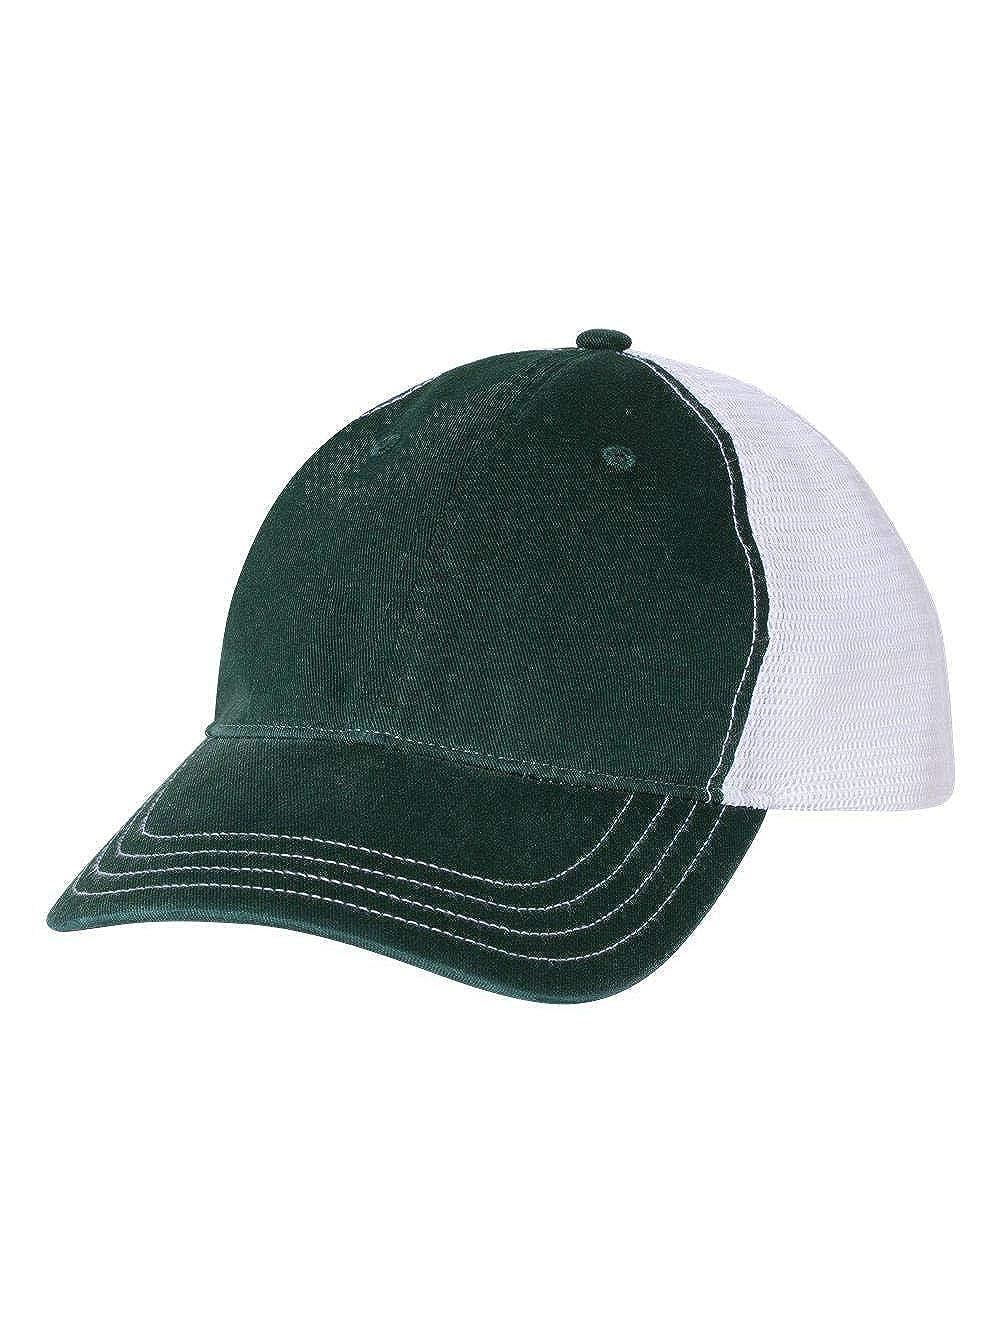 7178d05fd0f05 Amazon.com  Richardson Cap Adult Unisex 111 Garment Washed Front Mesh Back  Caps  Clothing